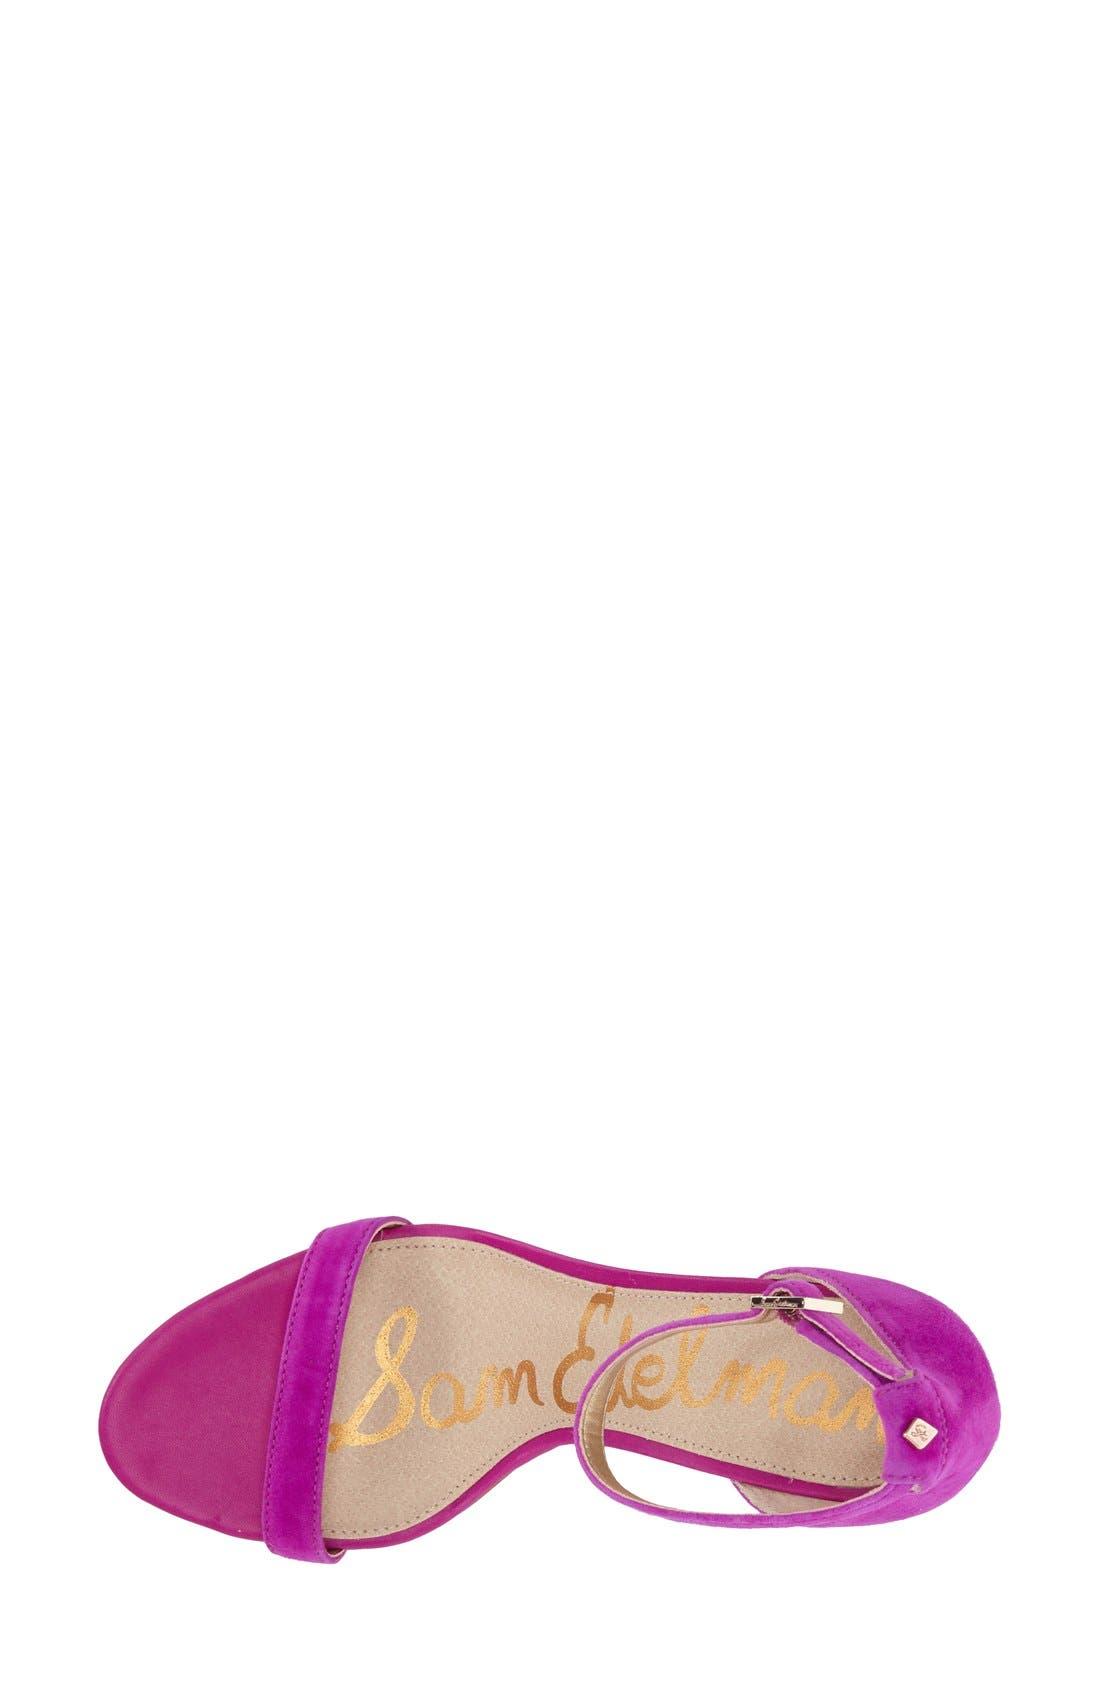 ,                             'Patti' Ankle Strap Sandal,                             Alternate thumbnail 206, color,                             651